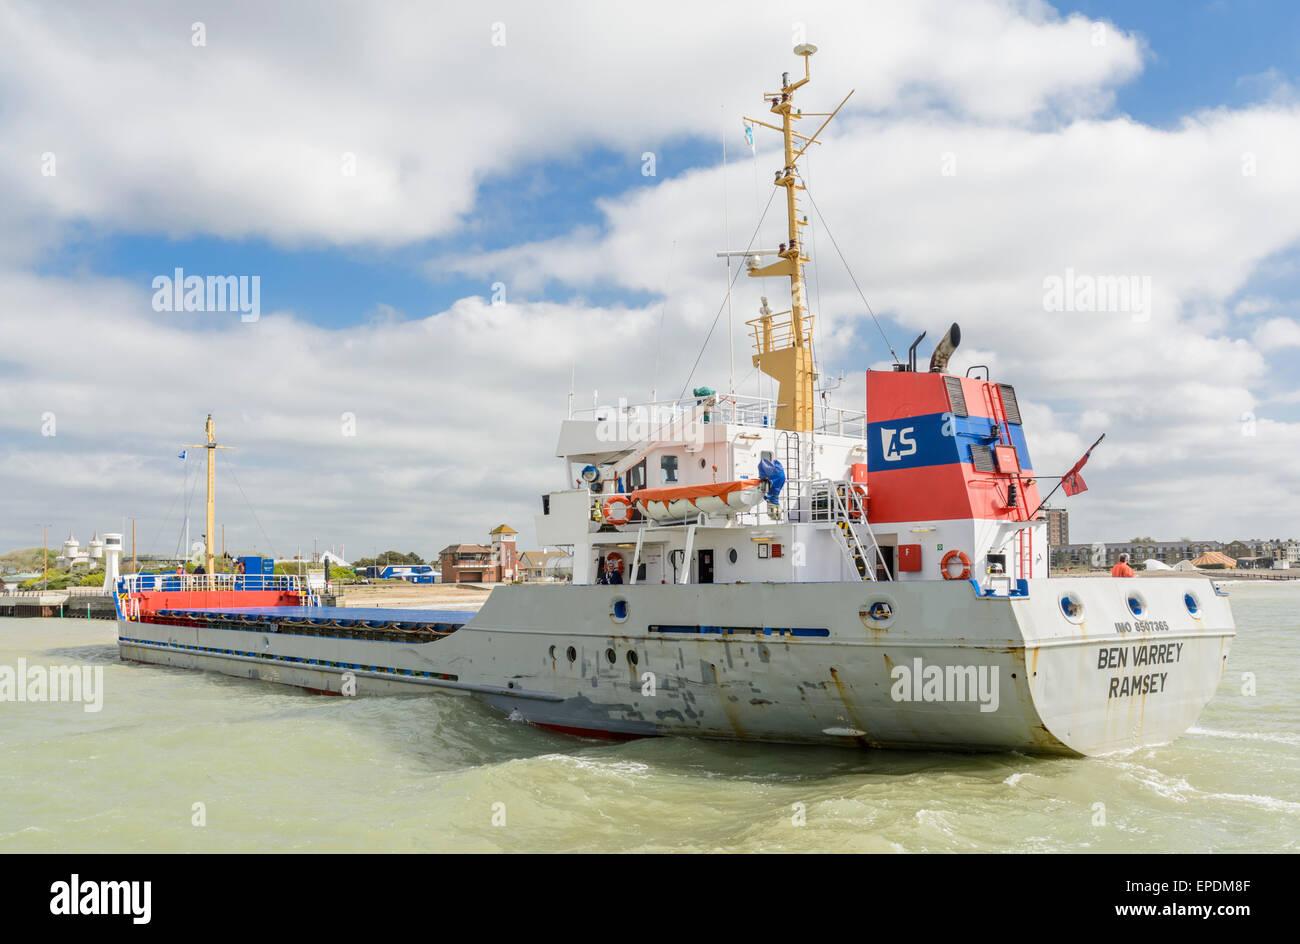 Cargo ship Ben Varrey coming into the River Arun estuary in Littlehampton, West Sussex, England, UK. - Stock Image